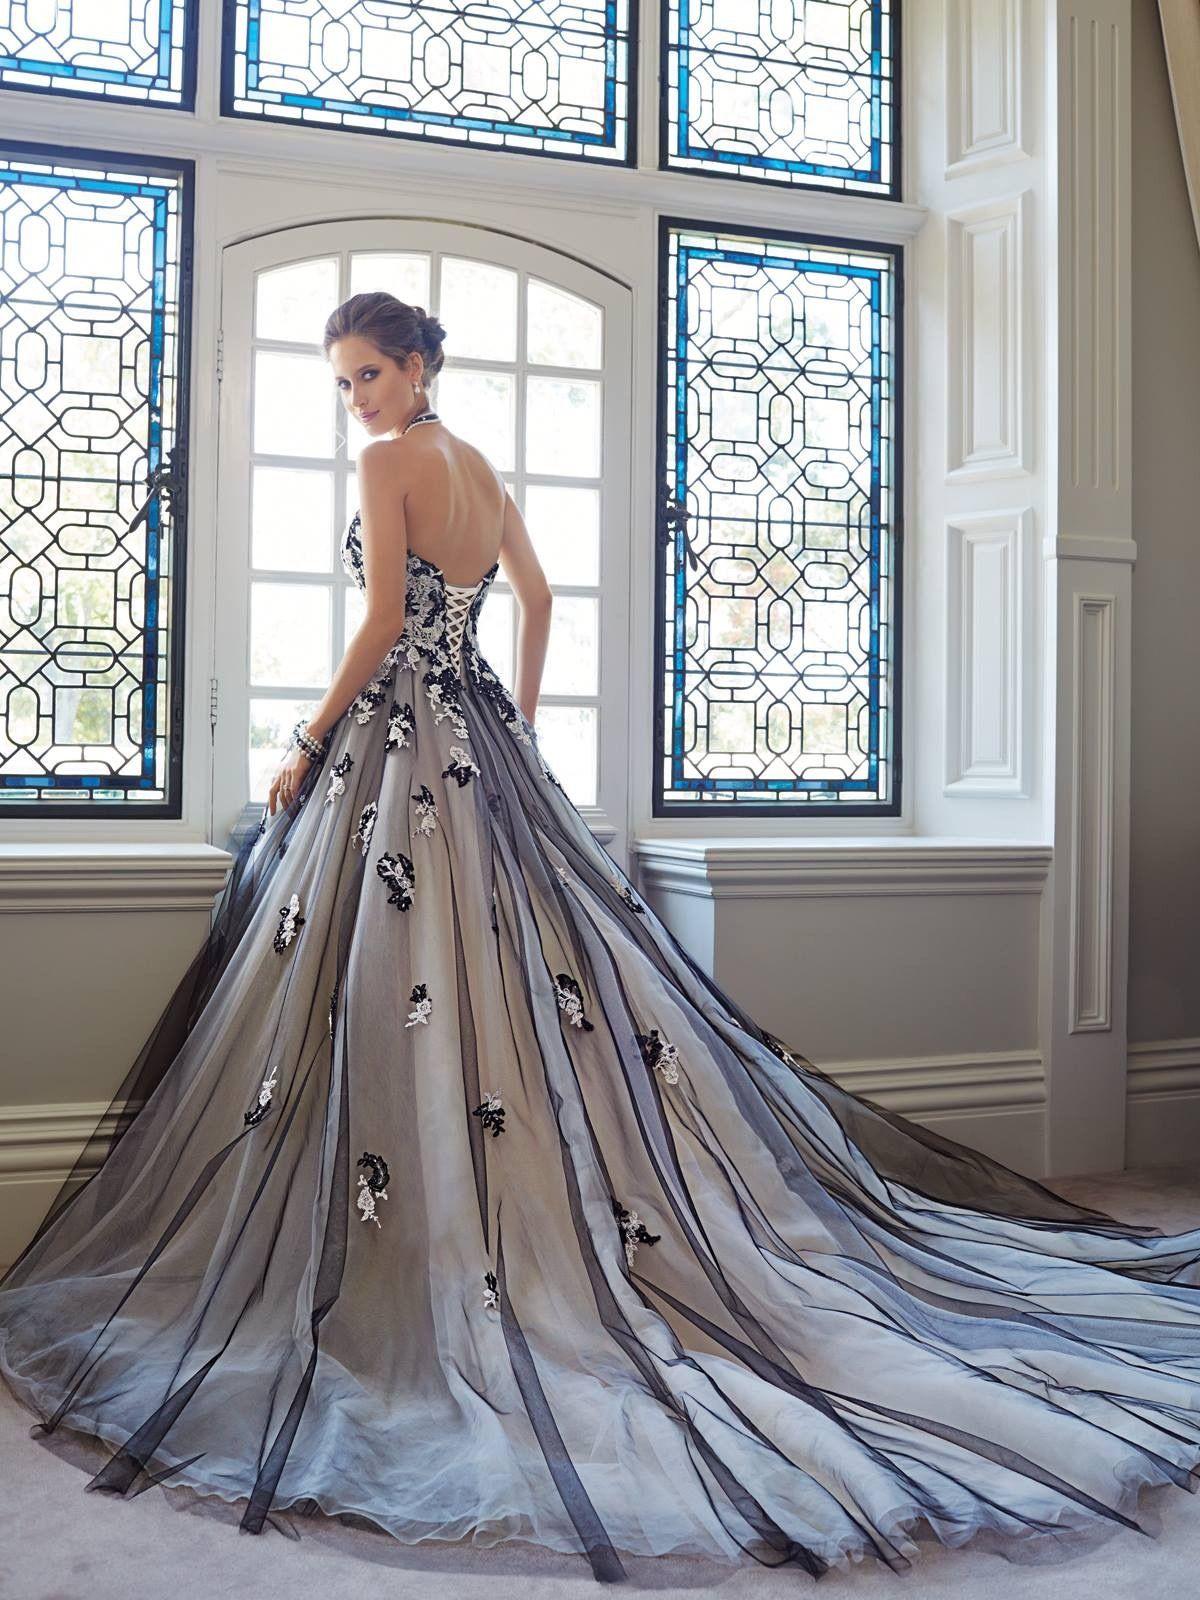 Pin by cara freeman on wedding dress ideas pinterest dress ideas